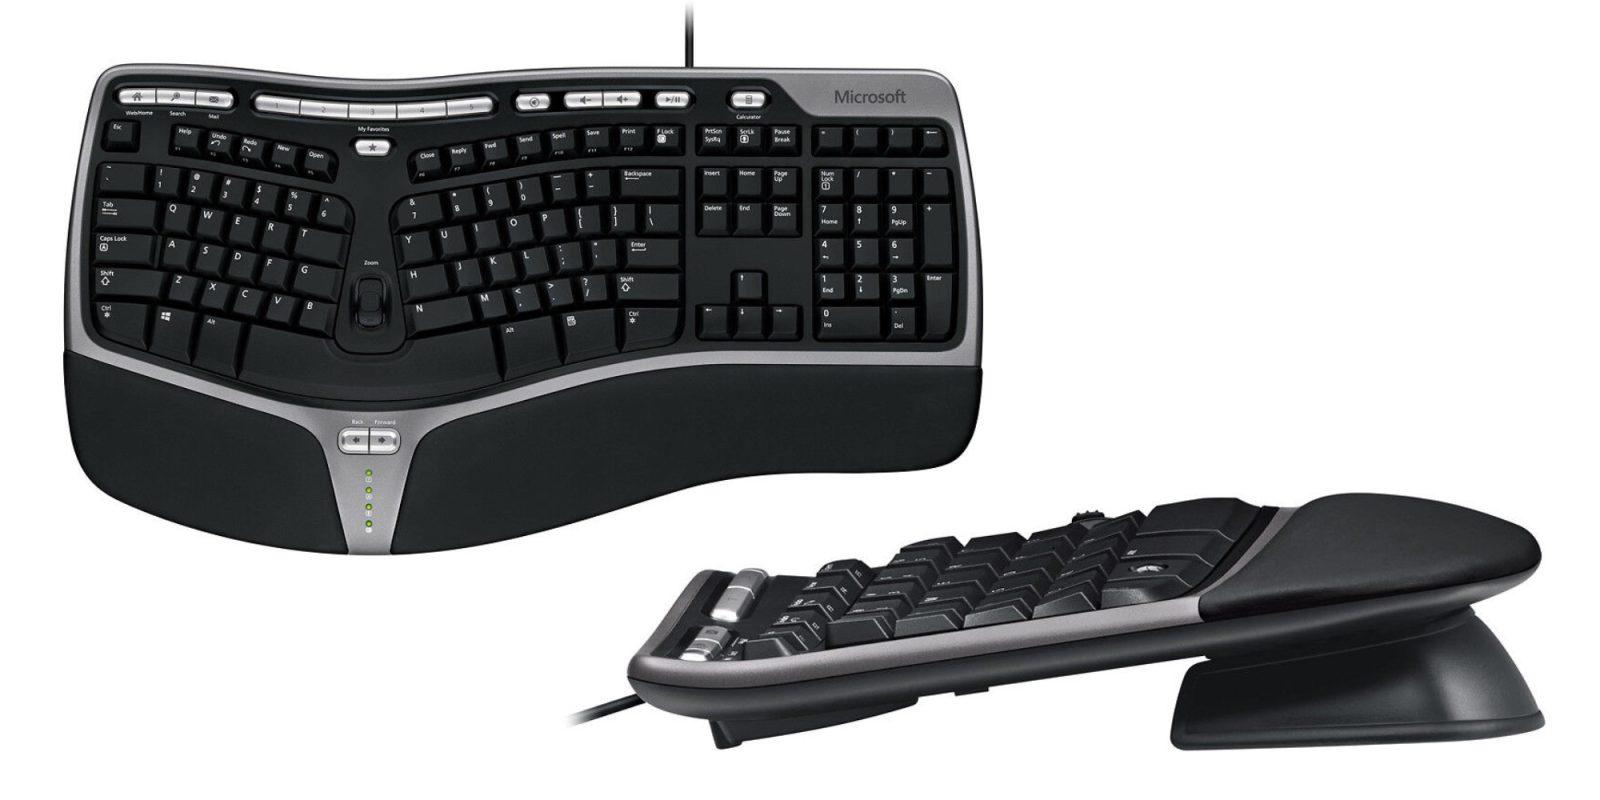 f9ba0ebc0ff Take 50% off Microsoft's Natural 4000 Ergonomic Keyboard at a new low:  $17.50